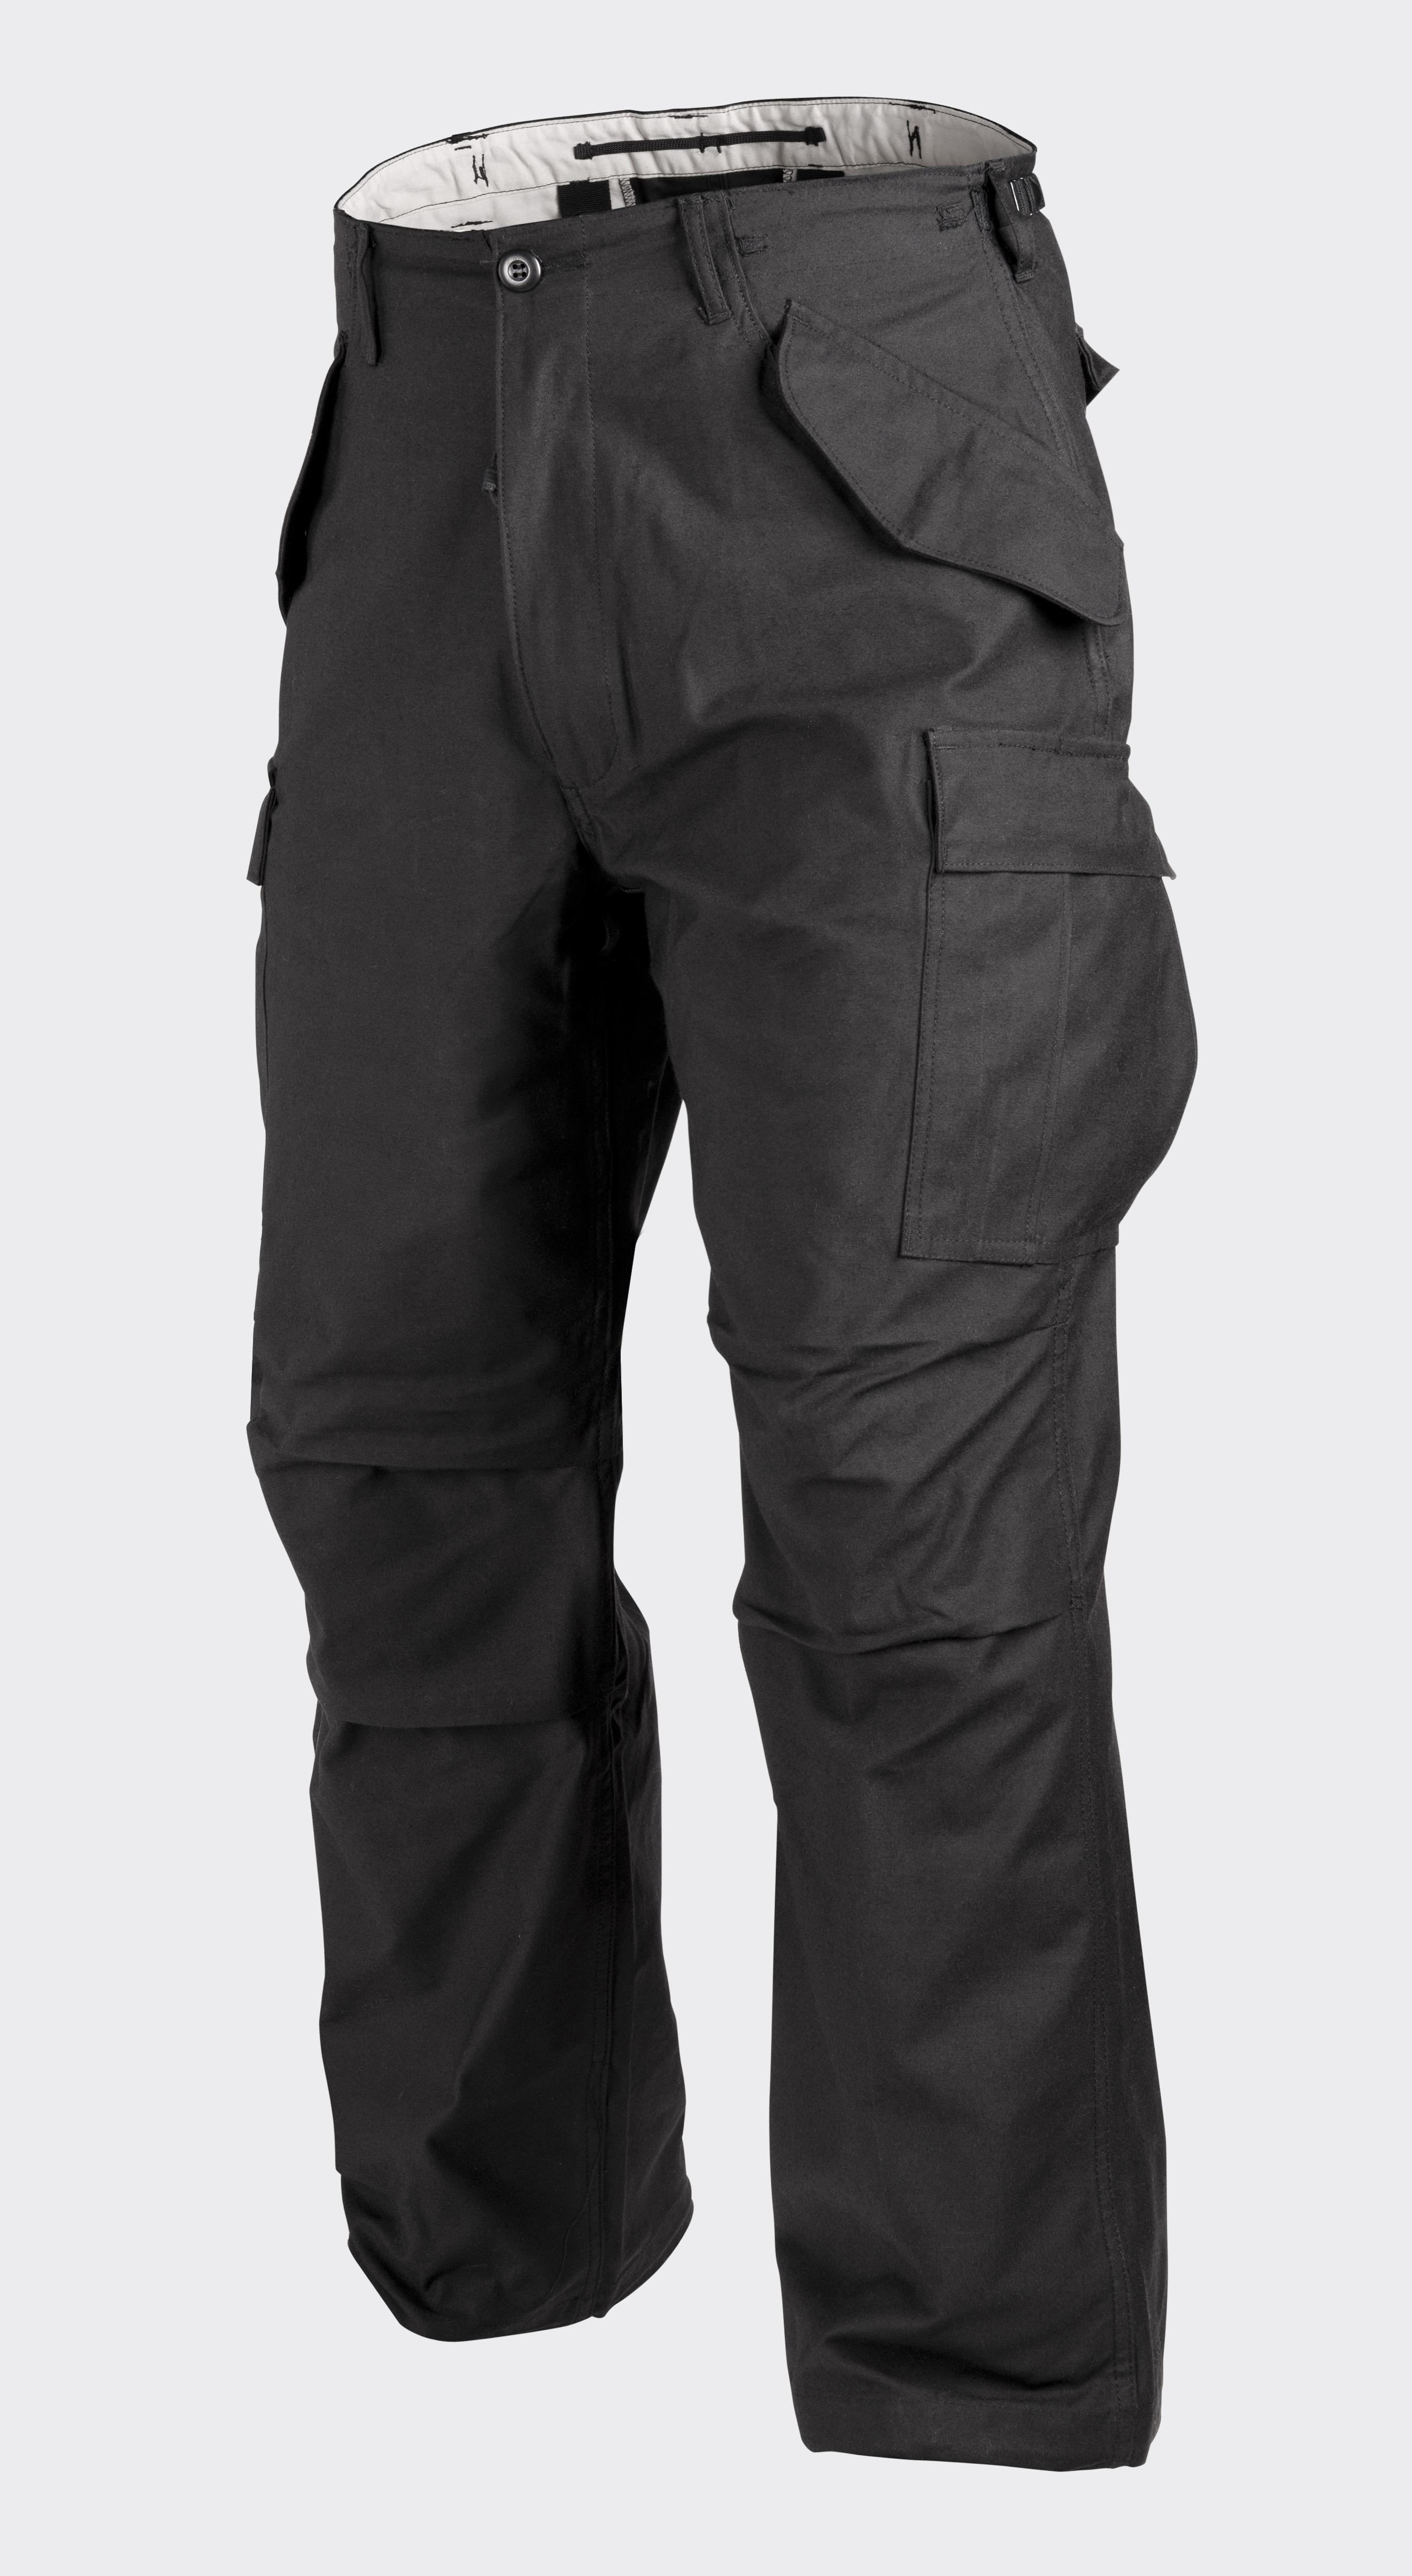 Spodnie M65 kolor czarny Helikon-tex